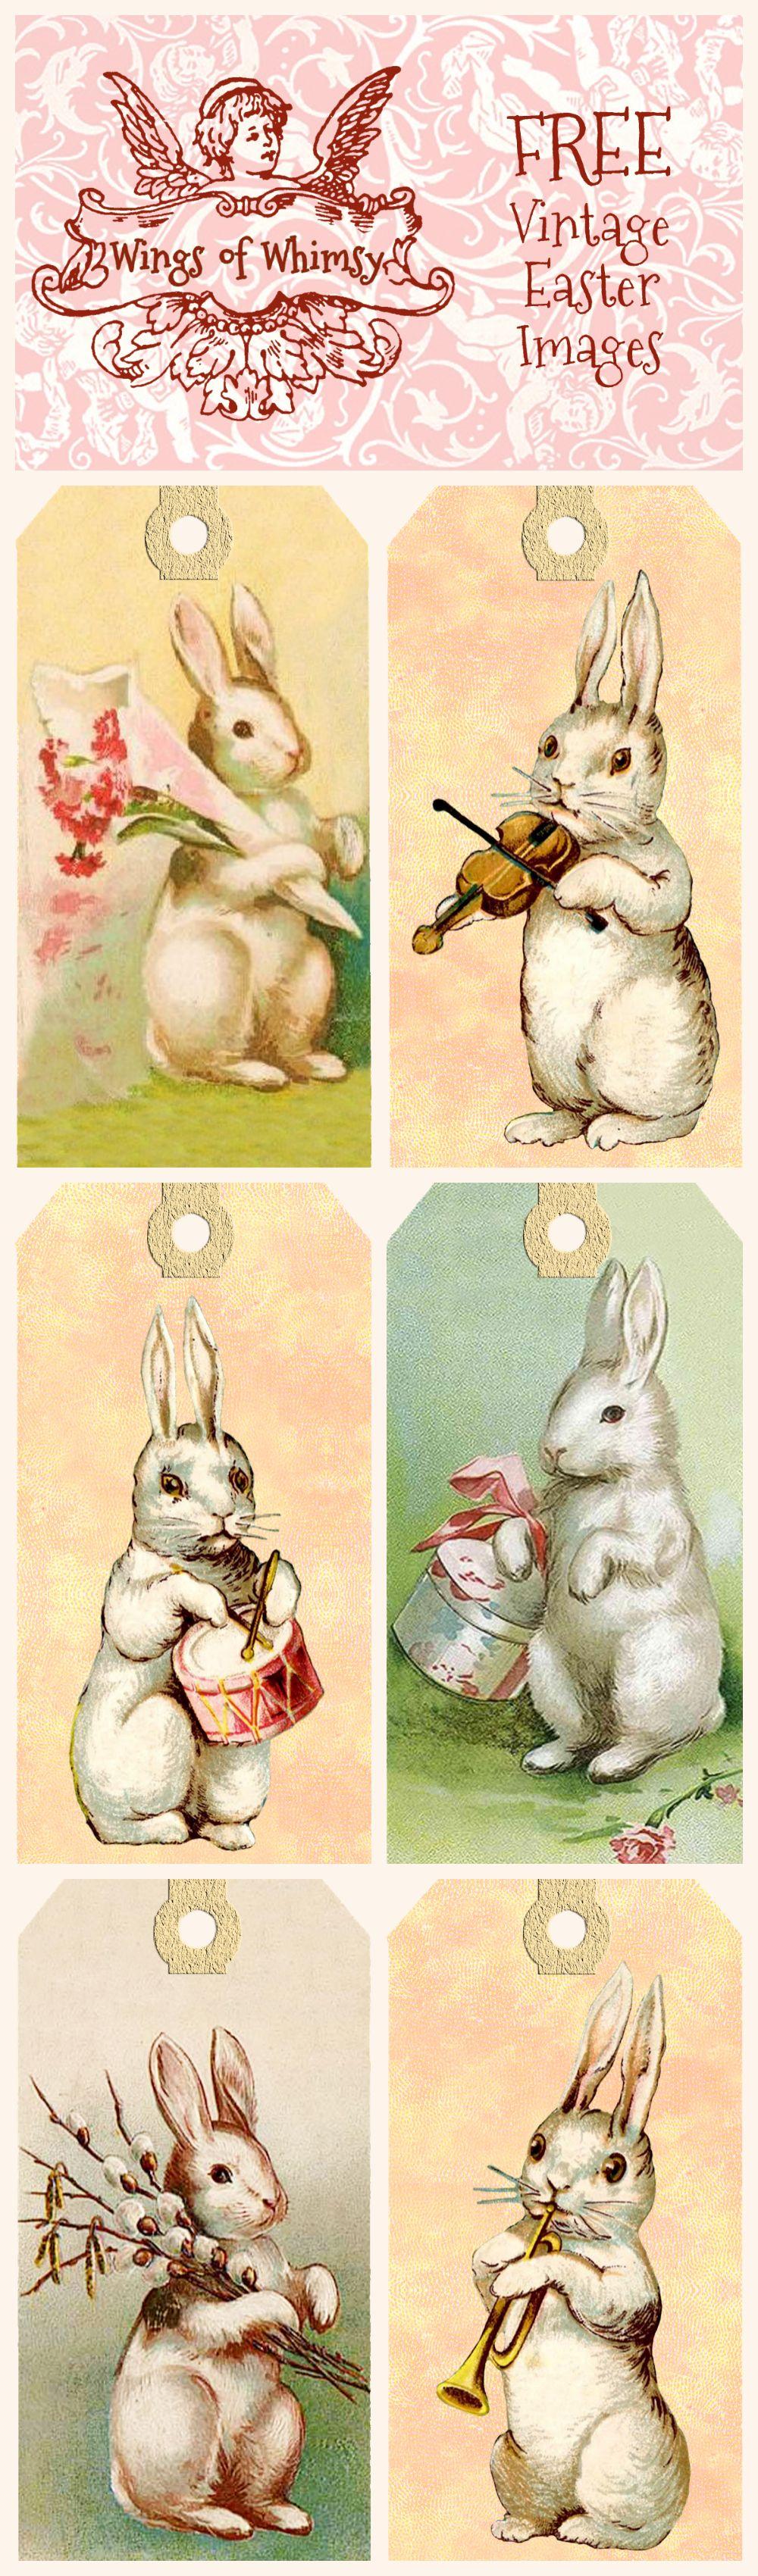 Vintage Easter Bunny Tags – Free Printables   Easter   Easter - Free Printable Vintage Easter Images